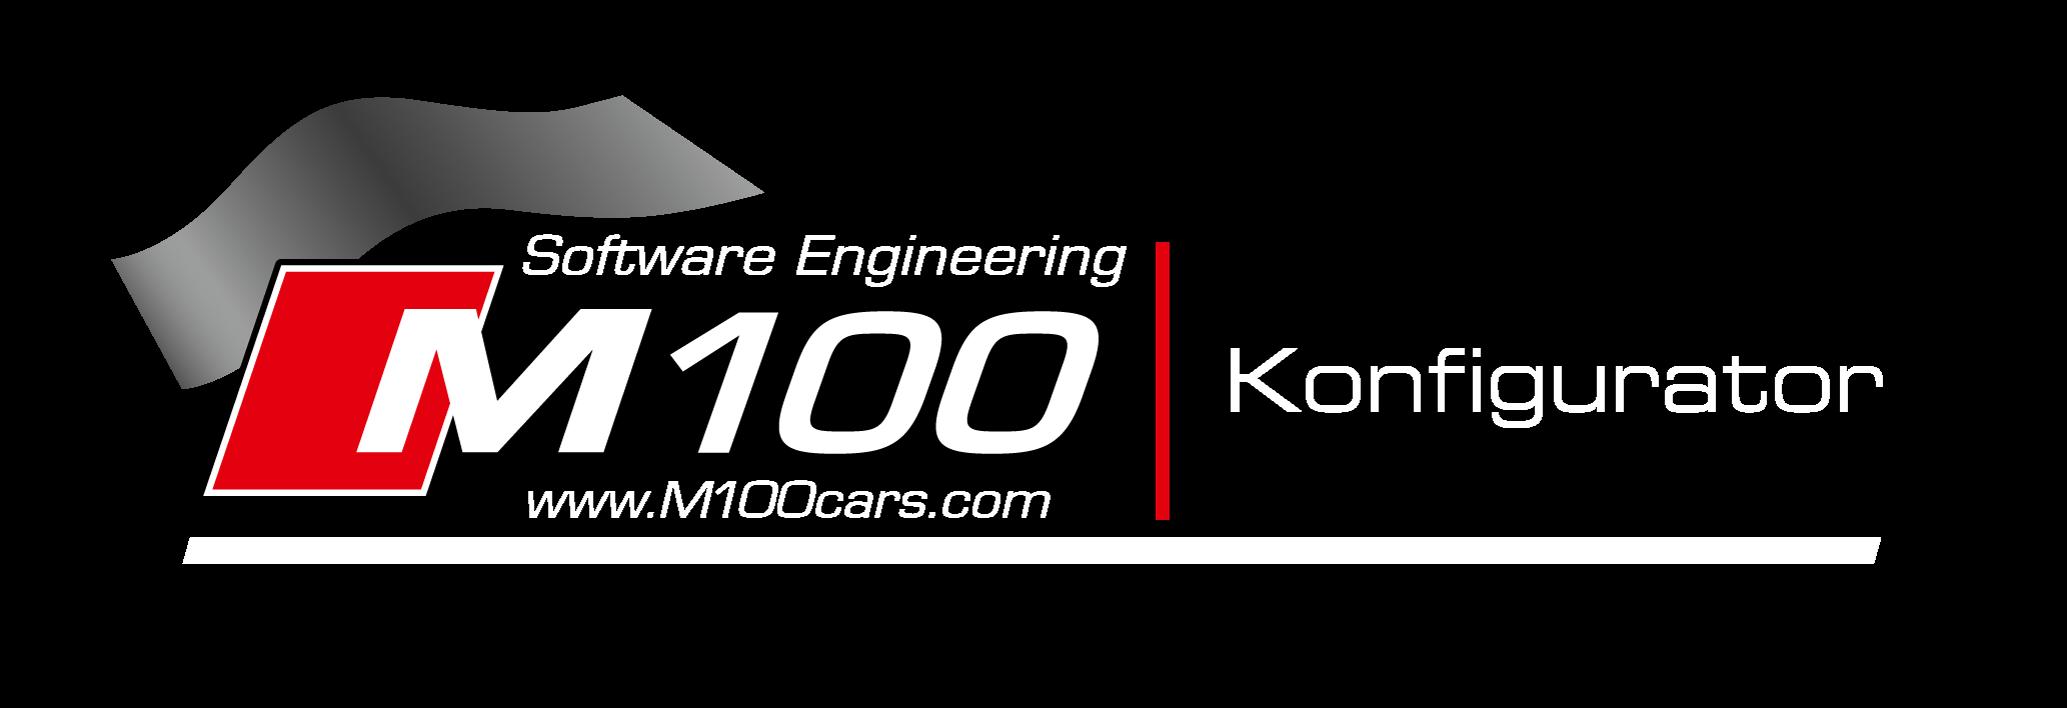 m100 Cars